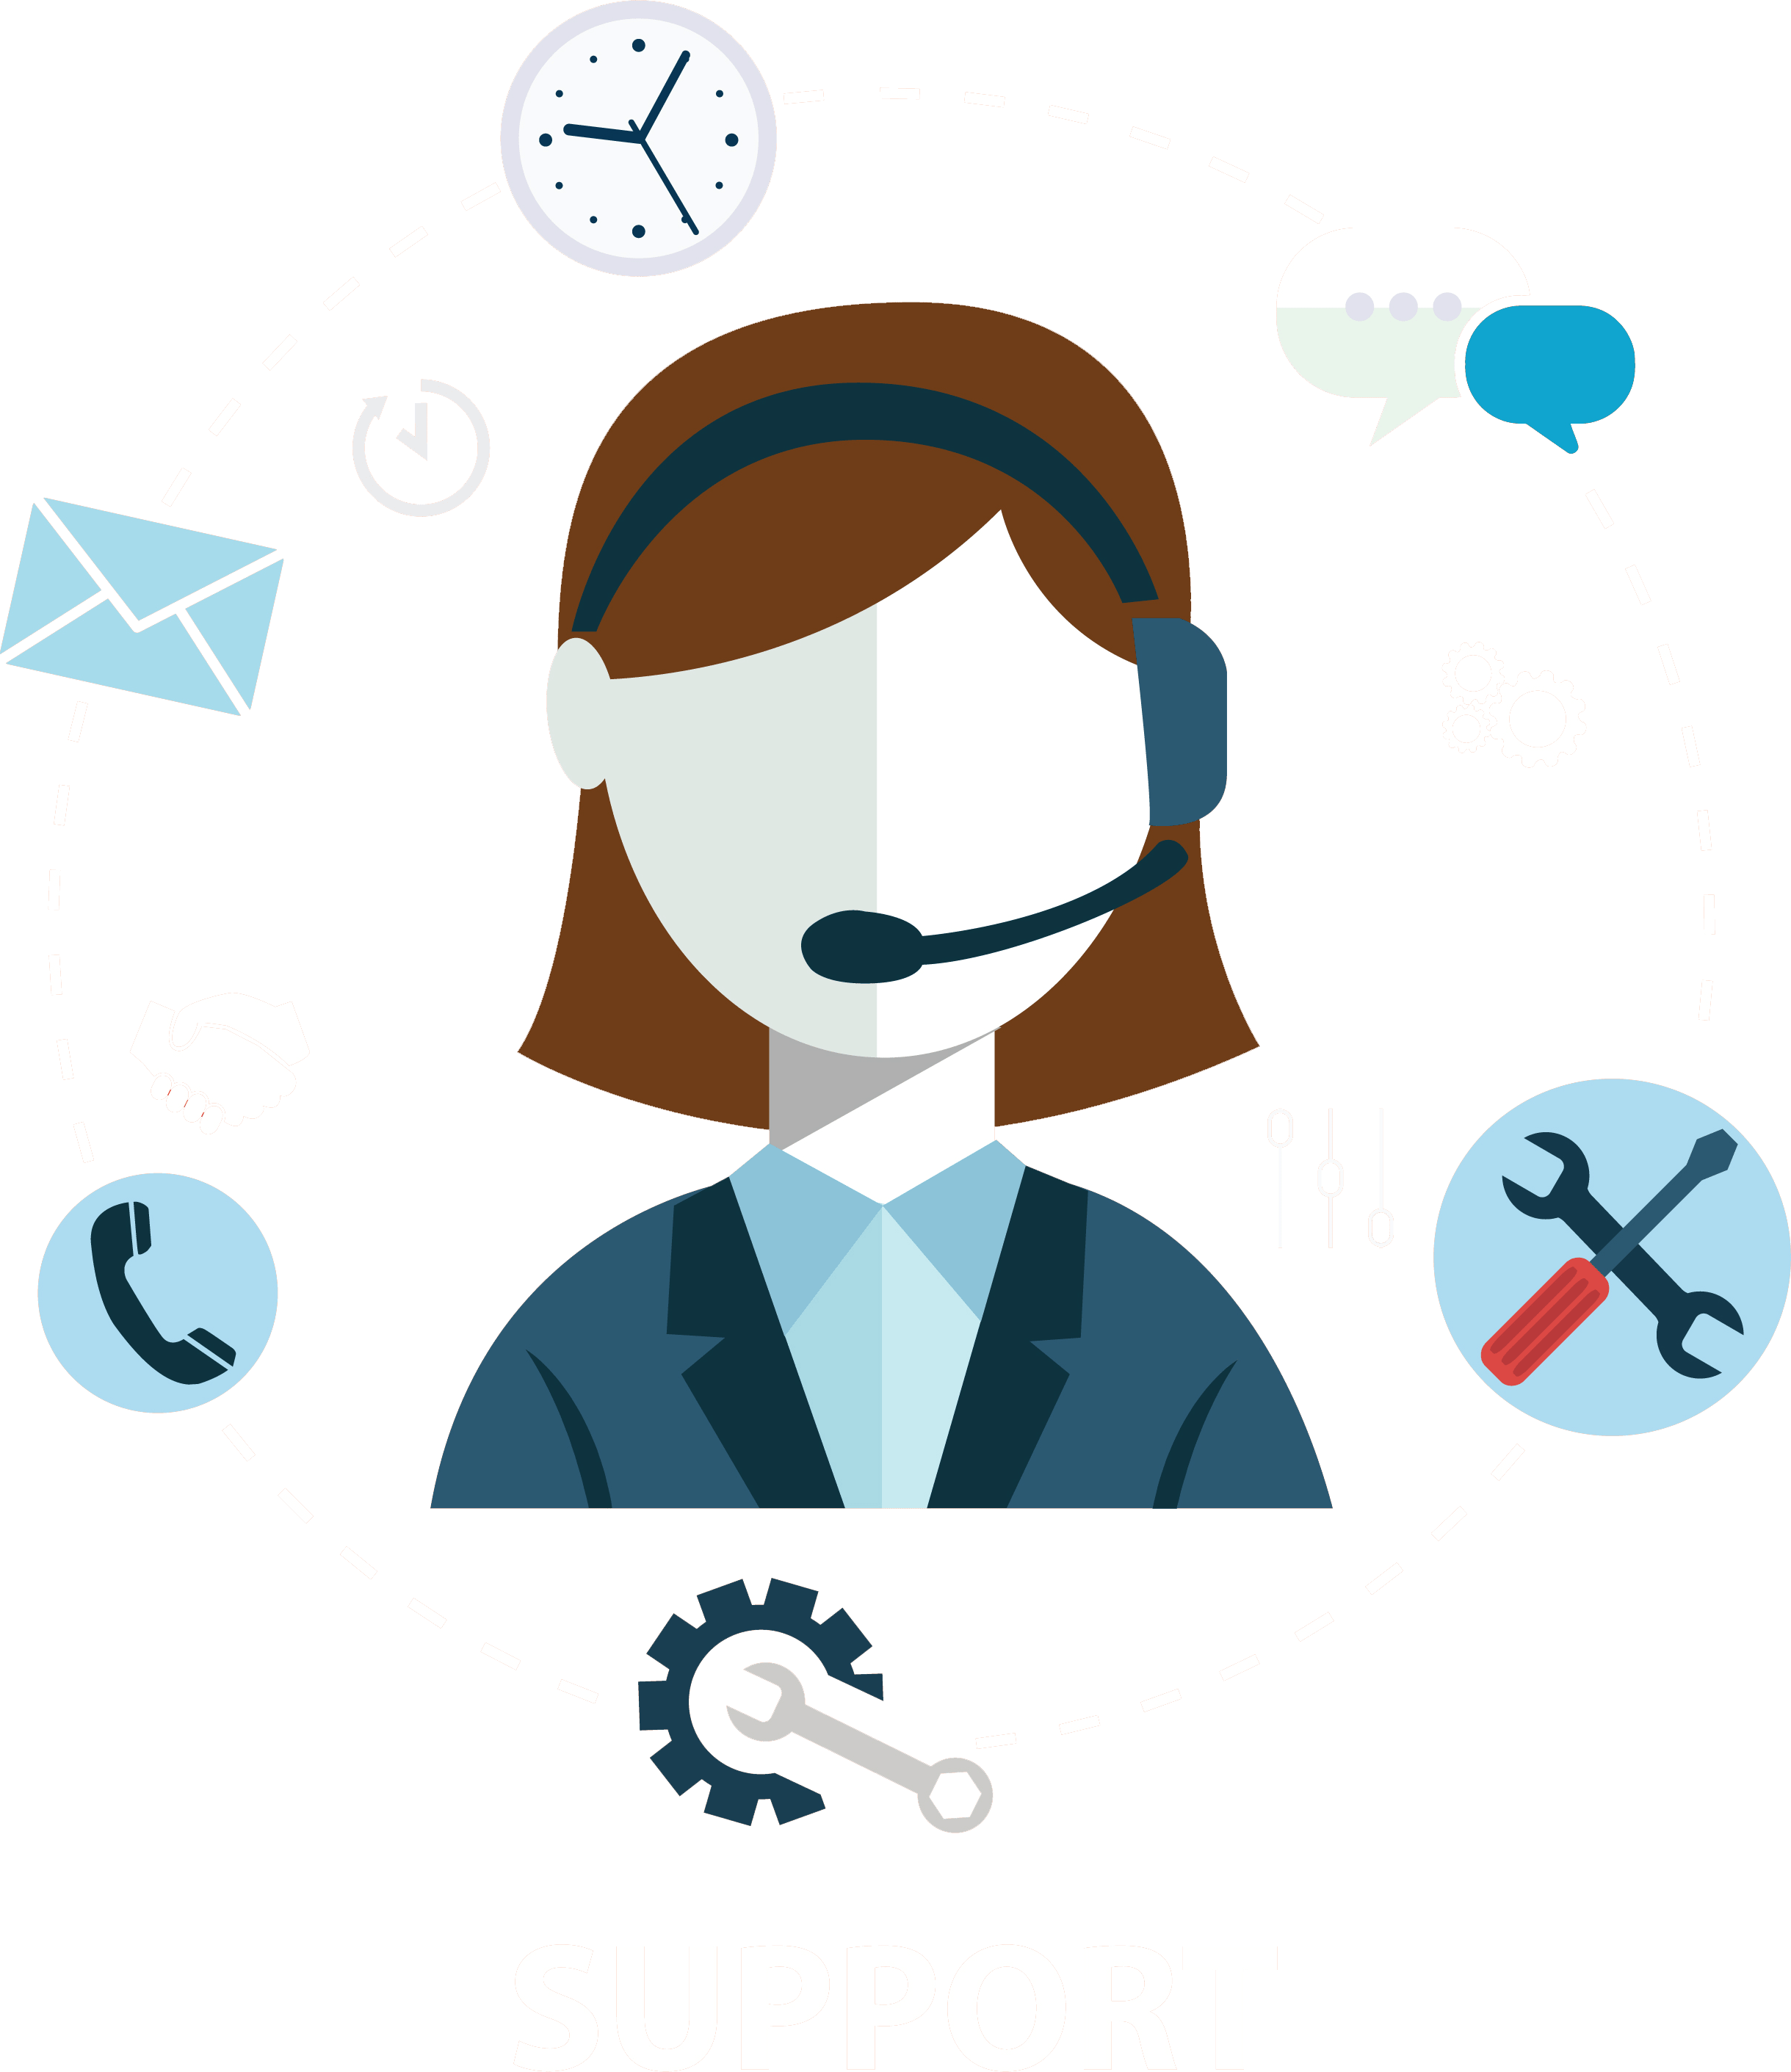 https://saletancy.com/wp-content/uploads/2021/08/customer-support-services.png